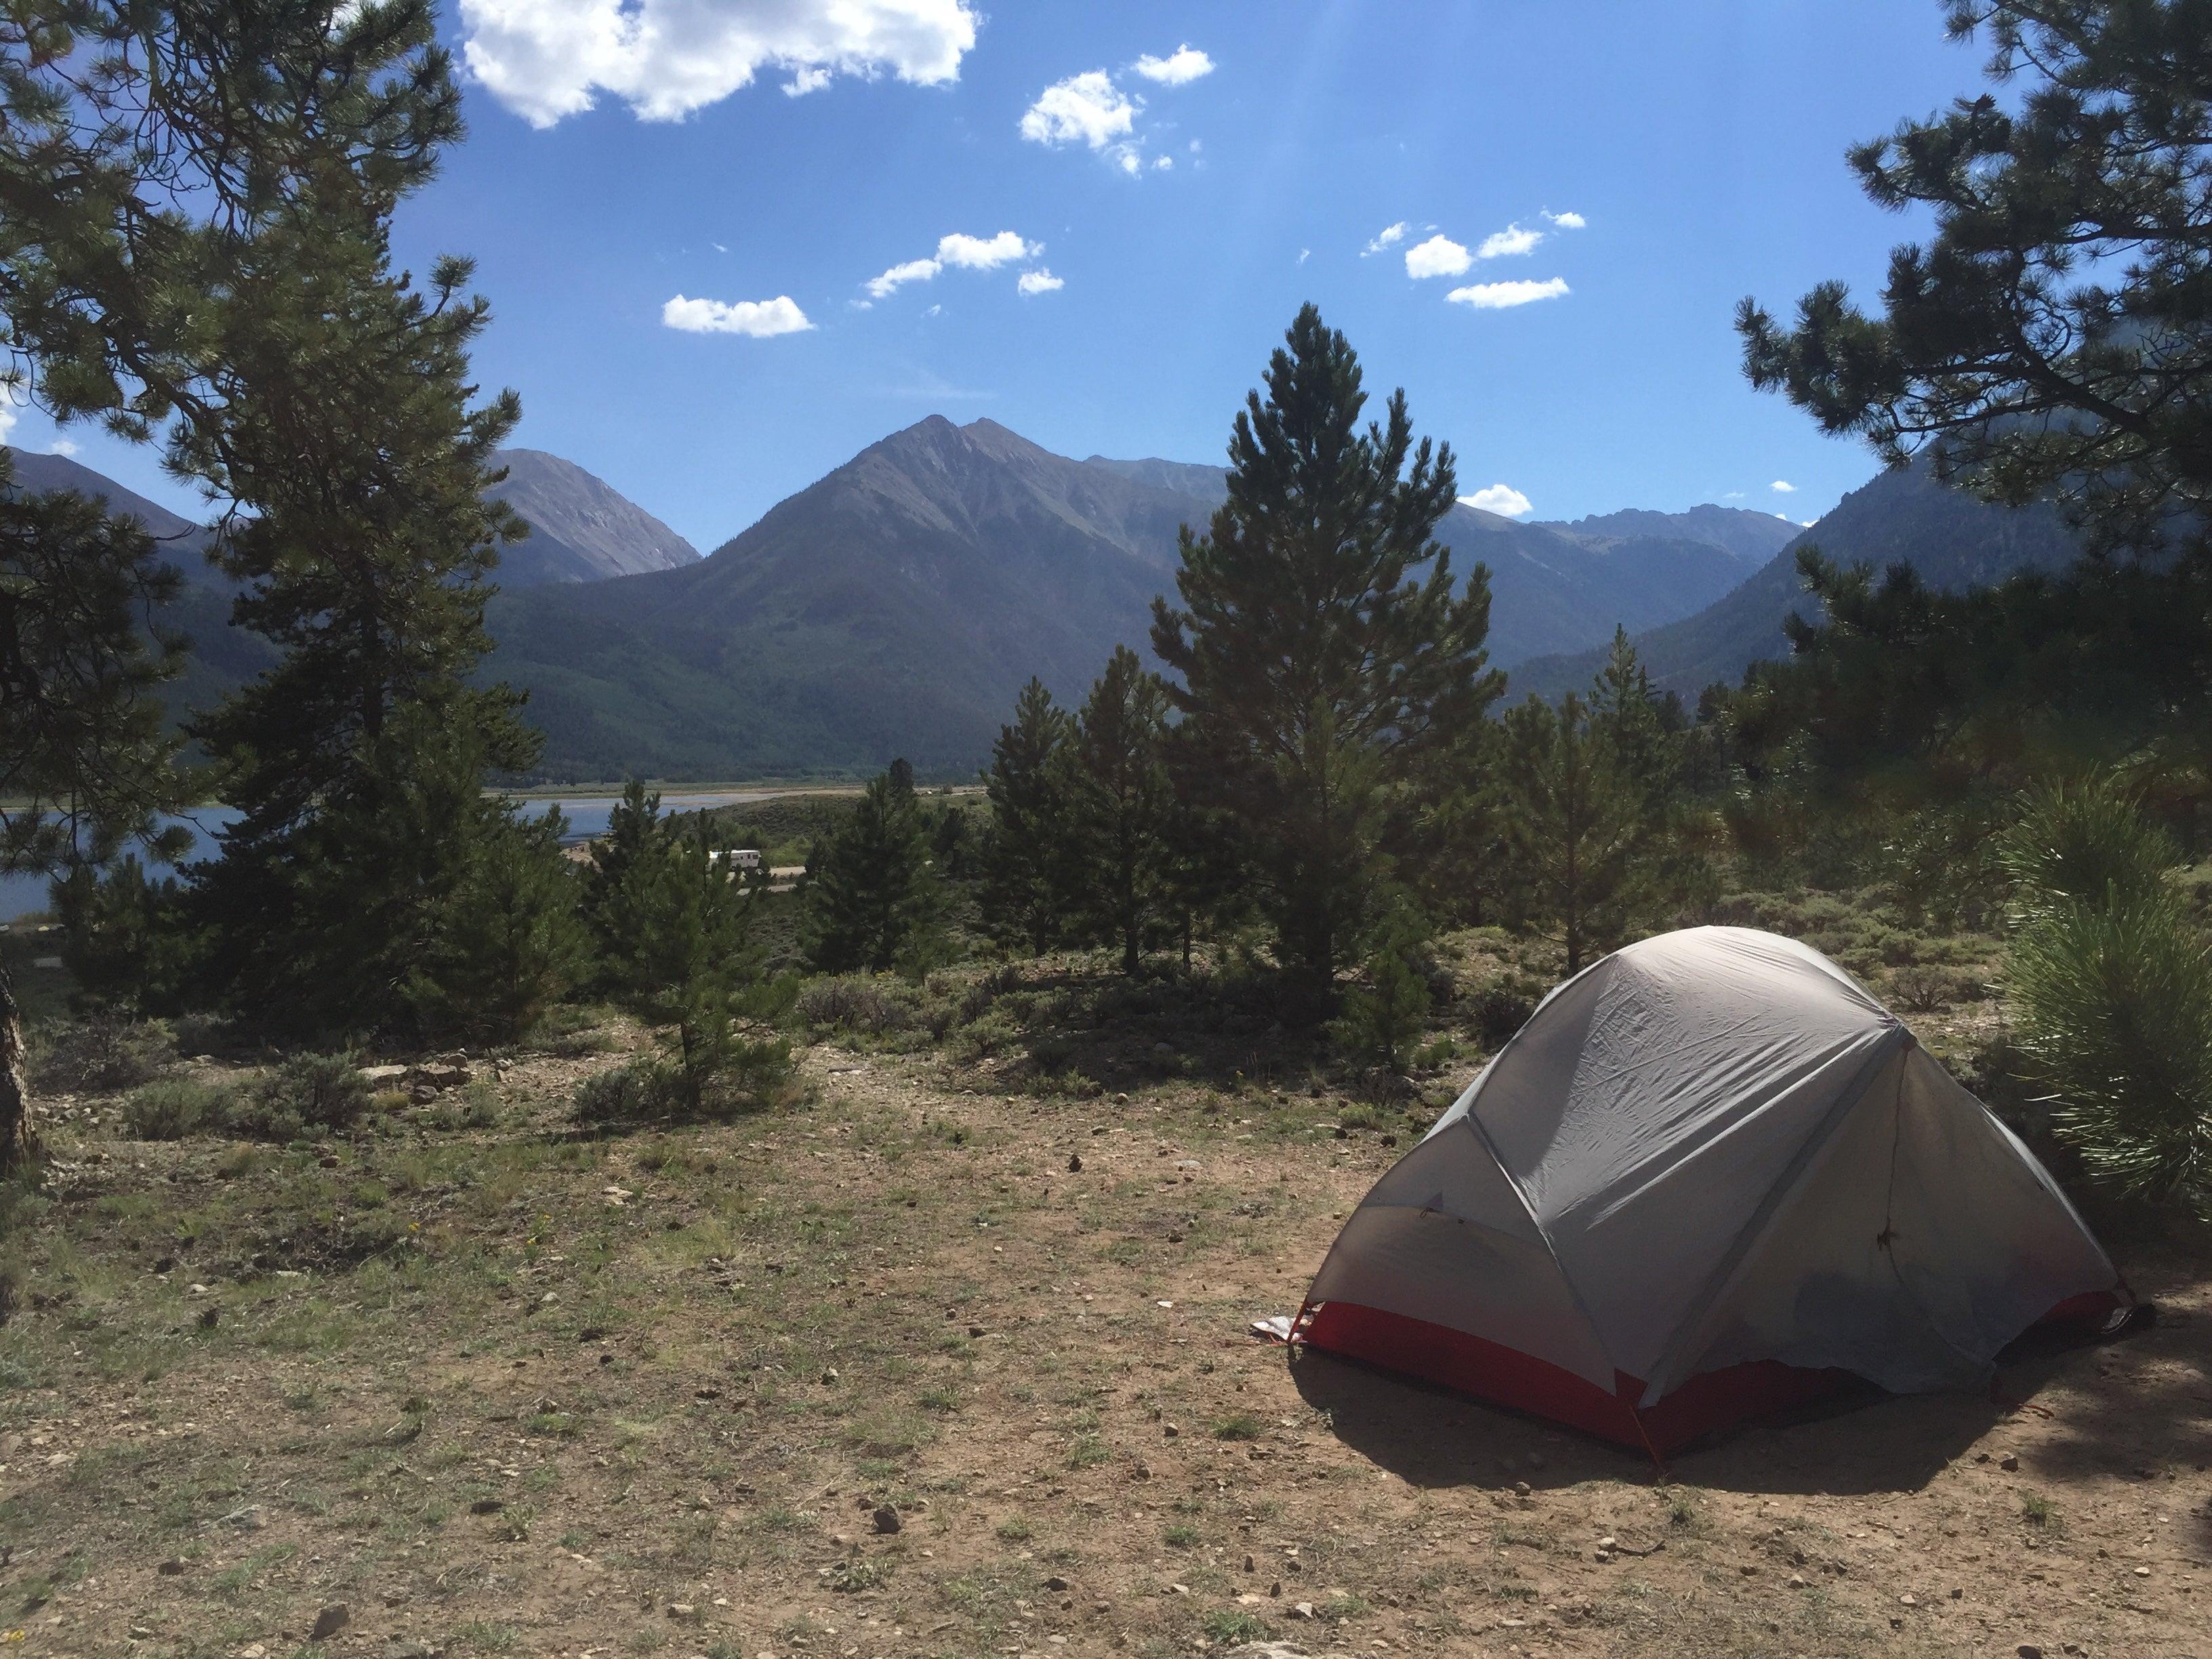 Camping in Raymond